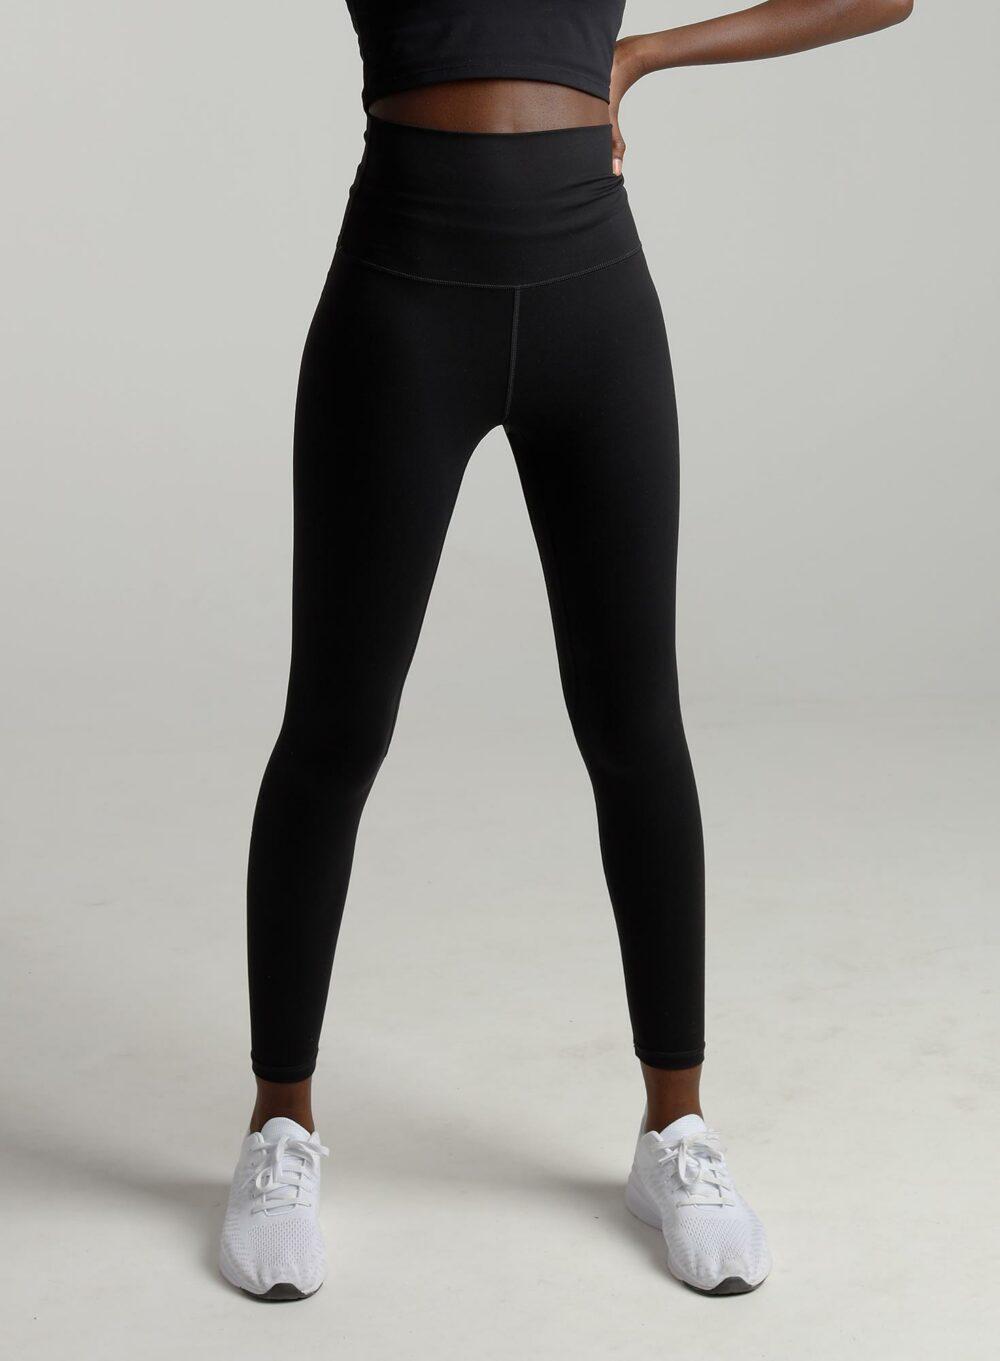 rs_high_waist_tights_bpb_black_1